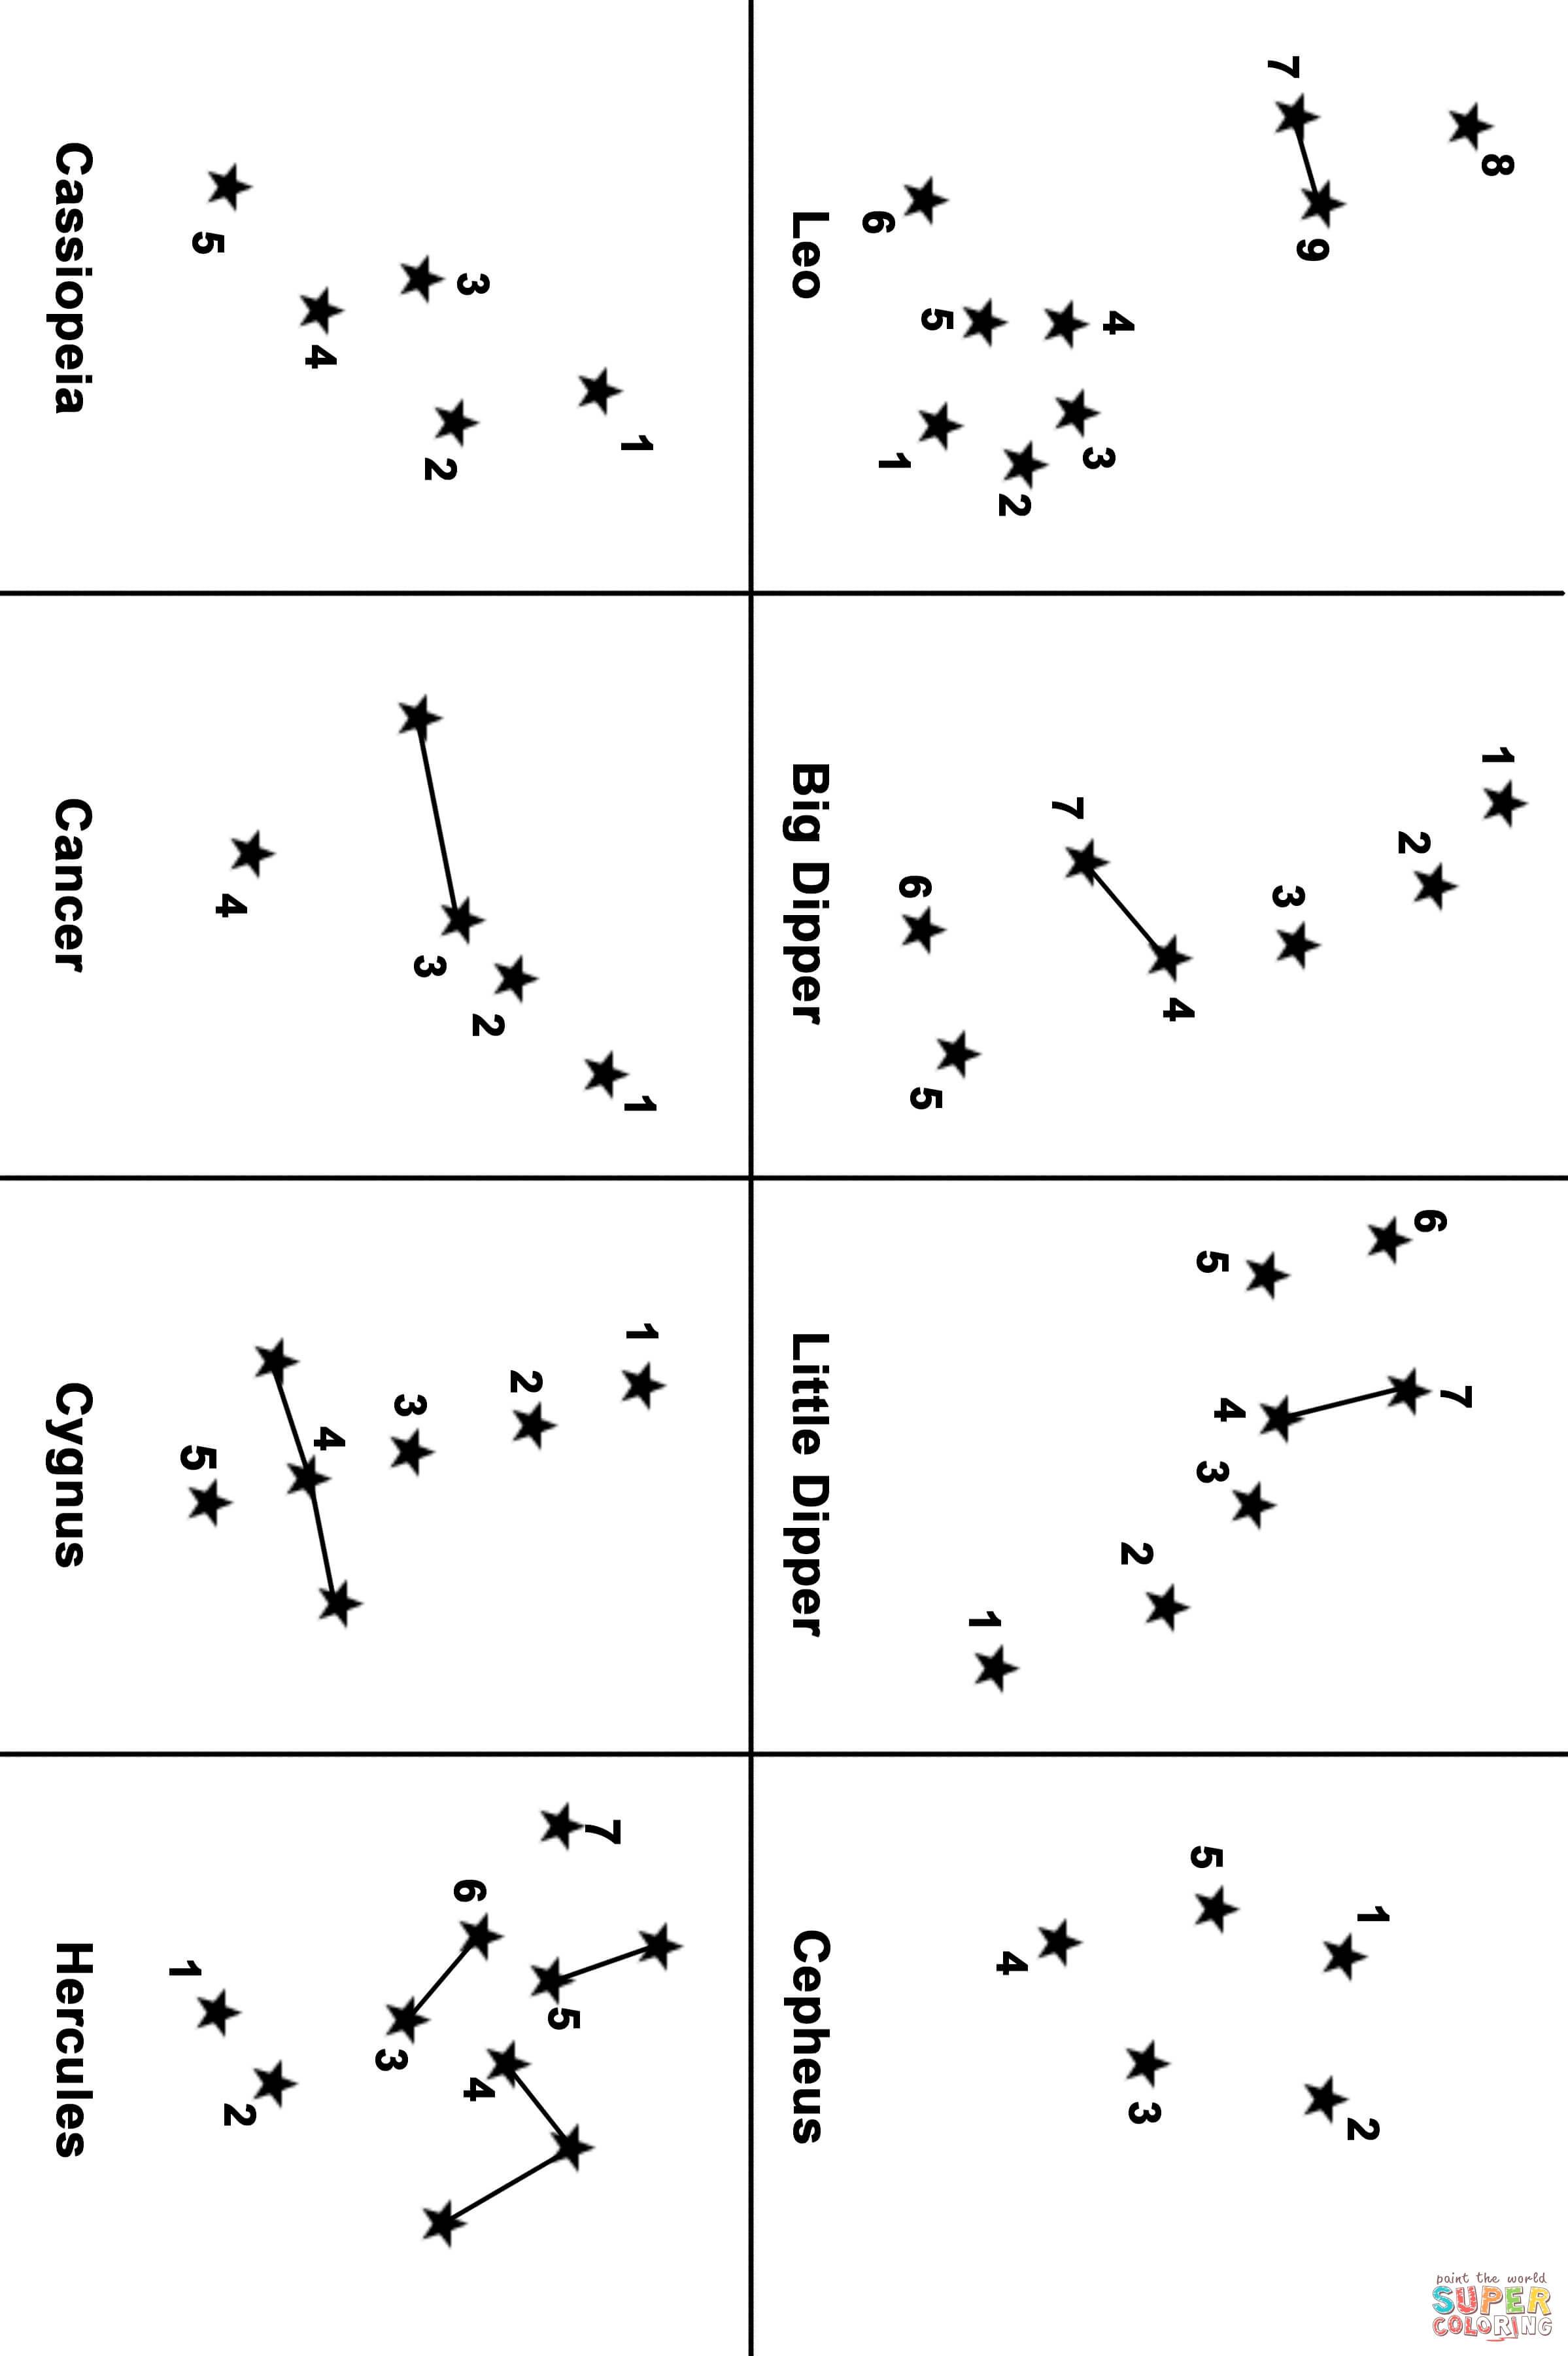 Coordinate Plane Connect Dots Worksheet